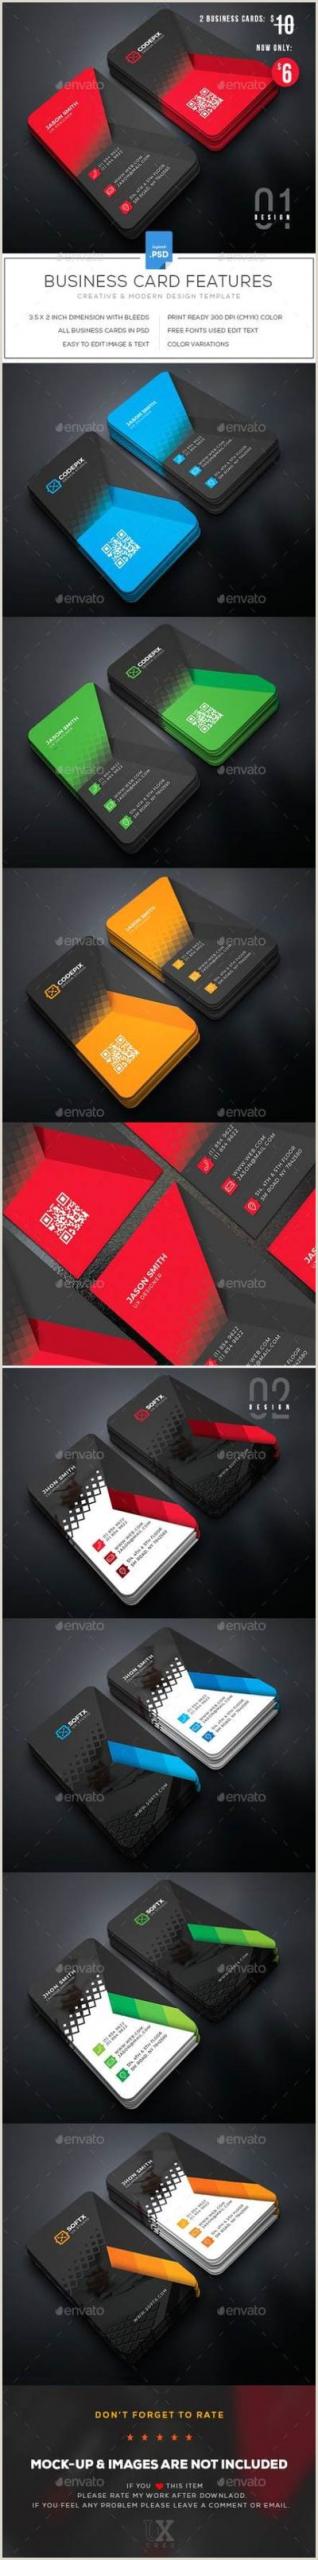 Business Card Simple Design Creative Modern Polygon Business Card